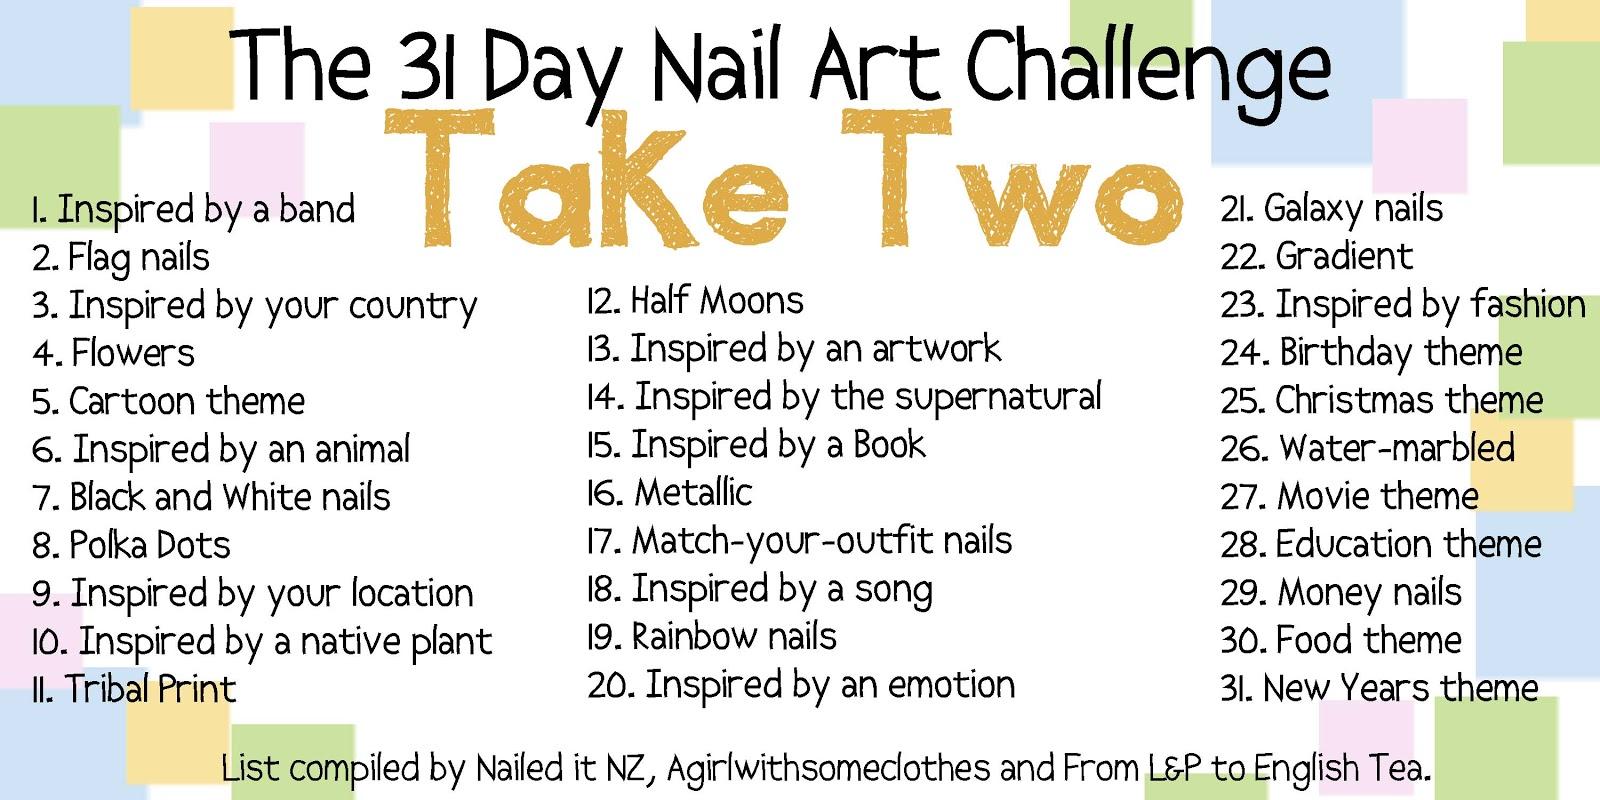 31 Day Nail Art Challenge